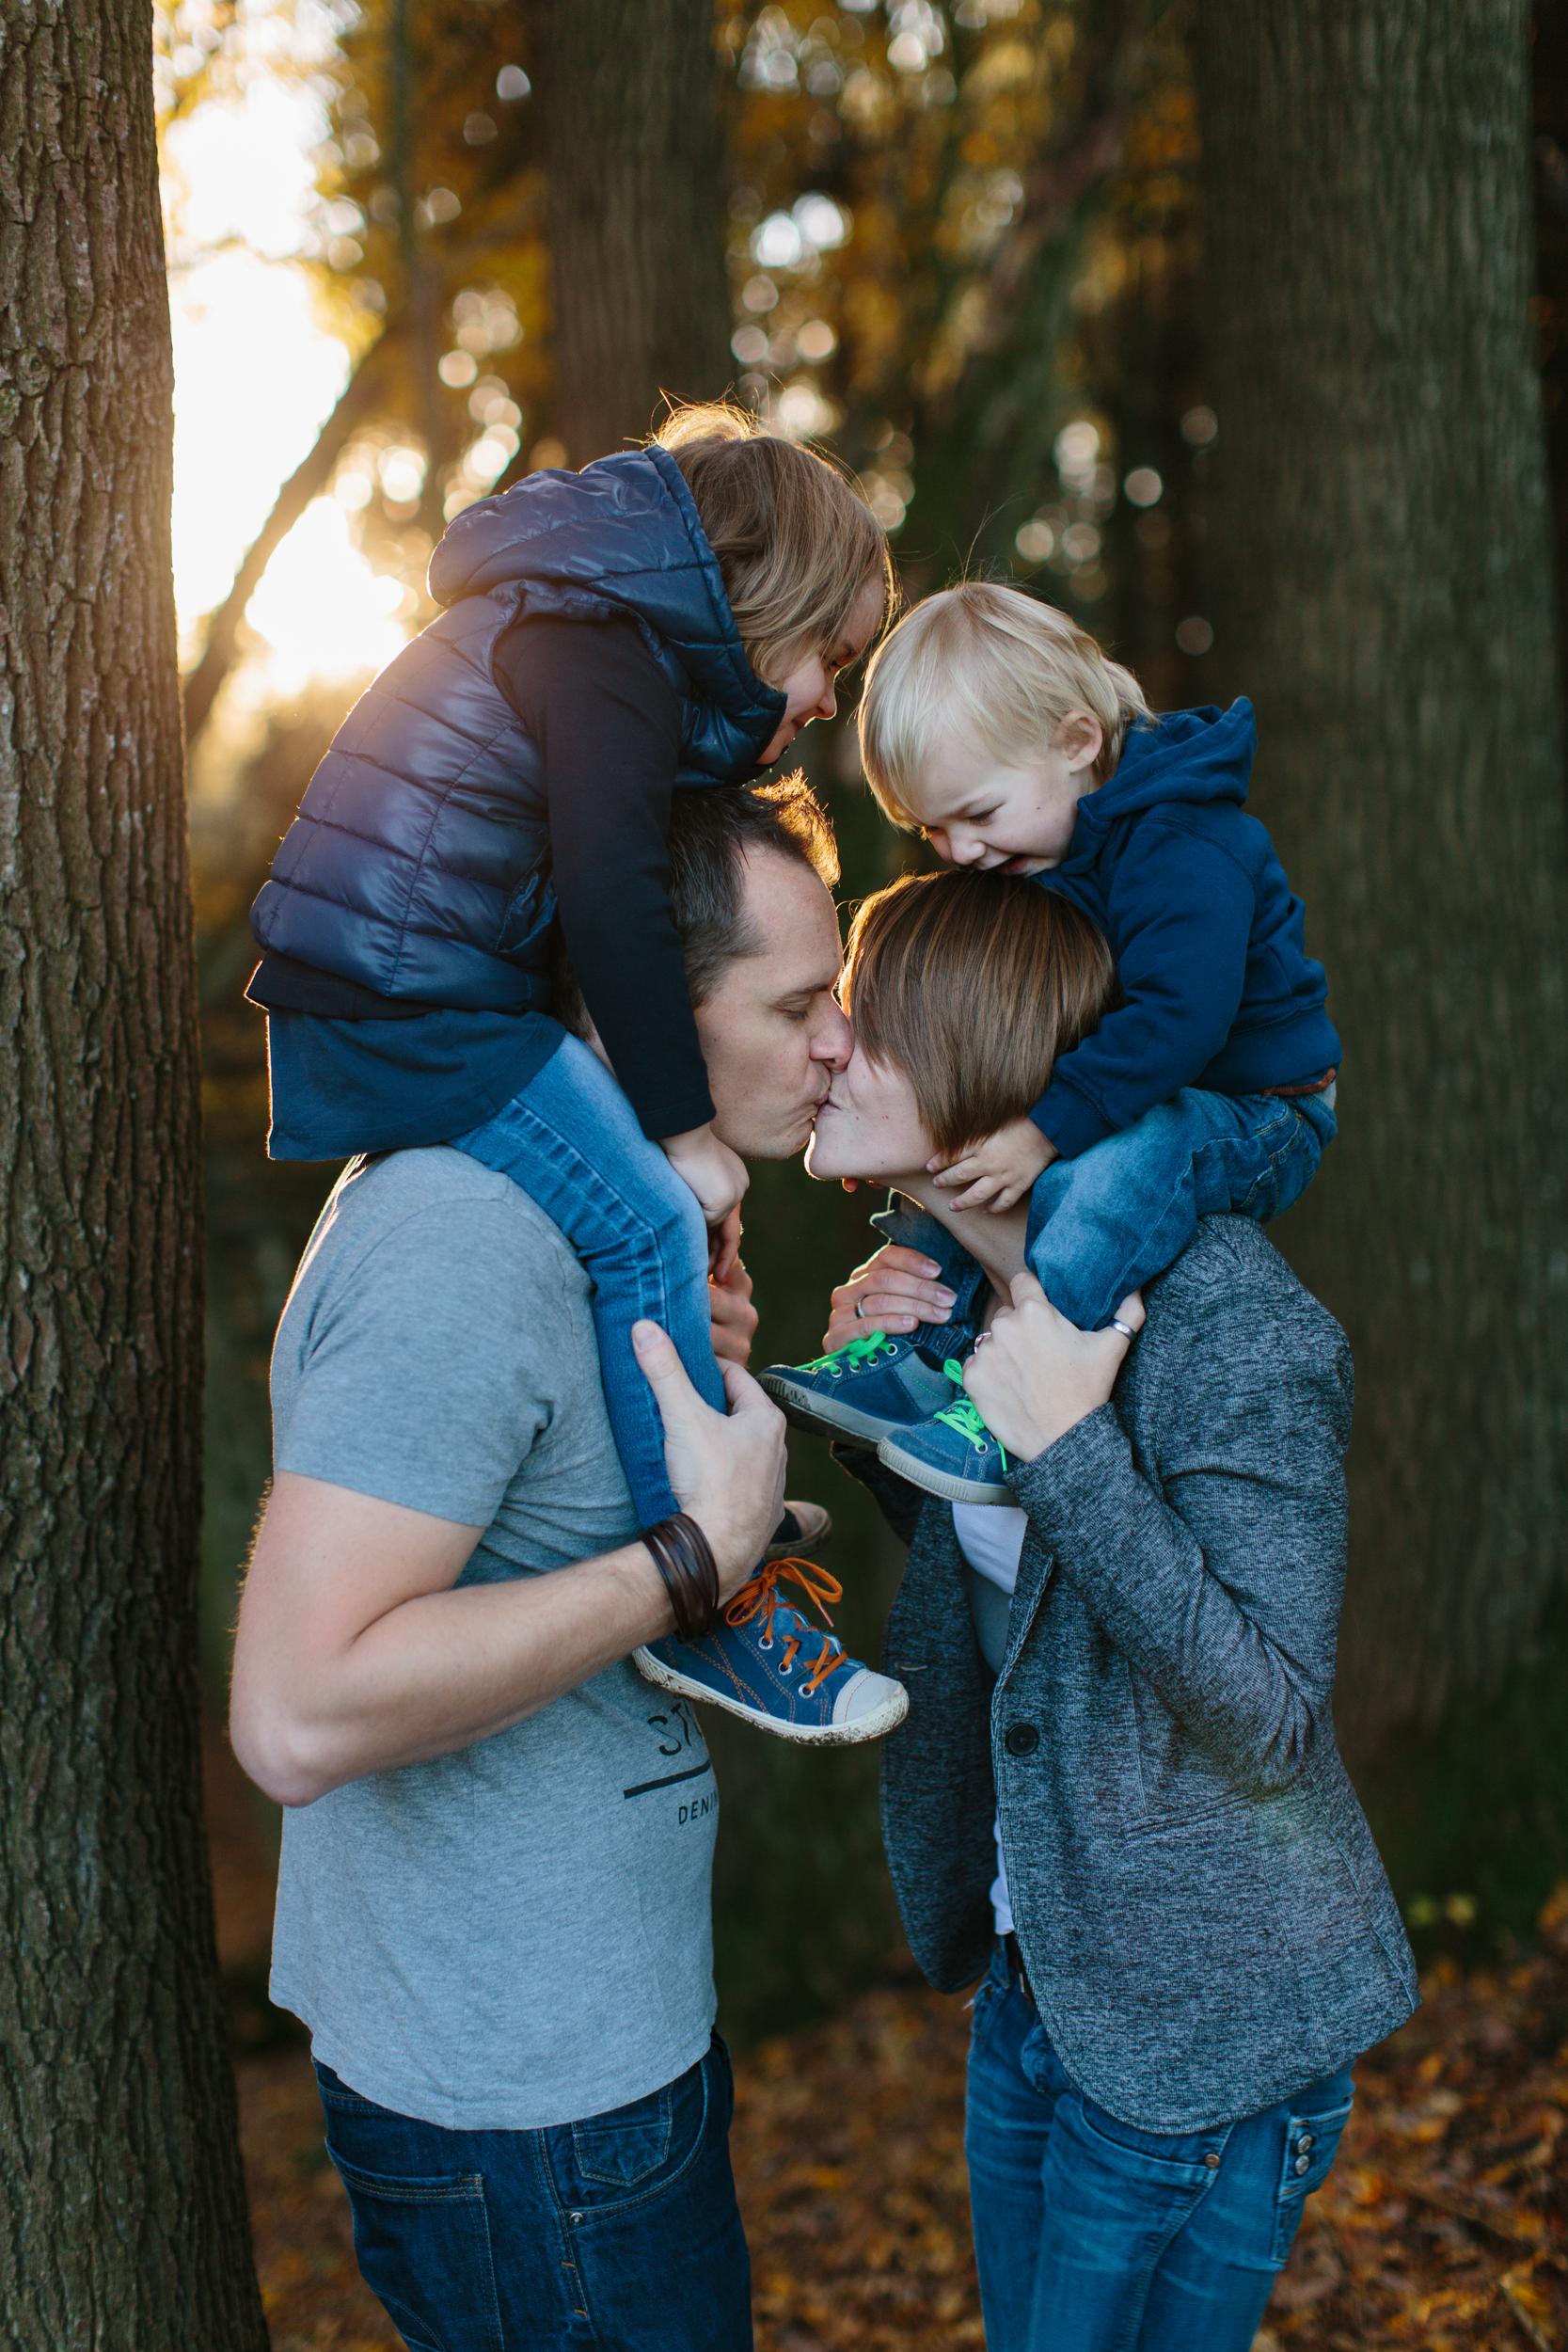 Familienfotos, Familienshooting, Fotoshooting